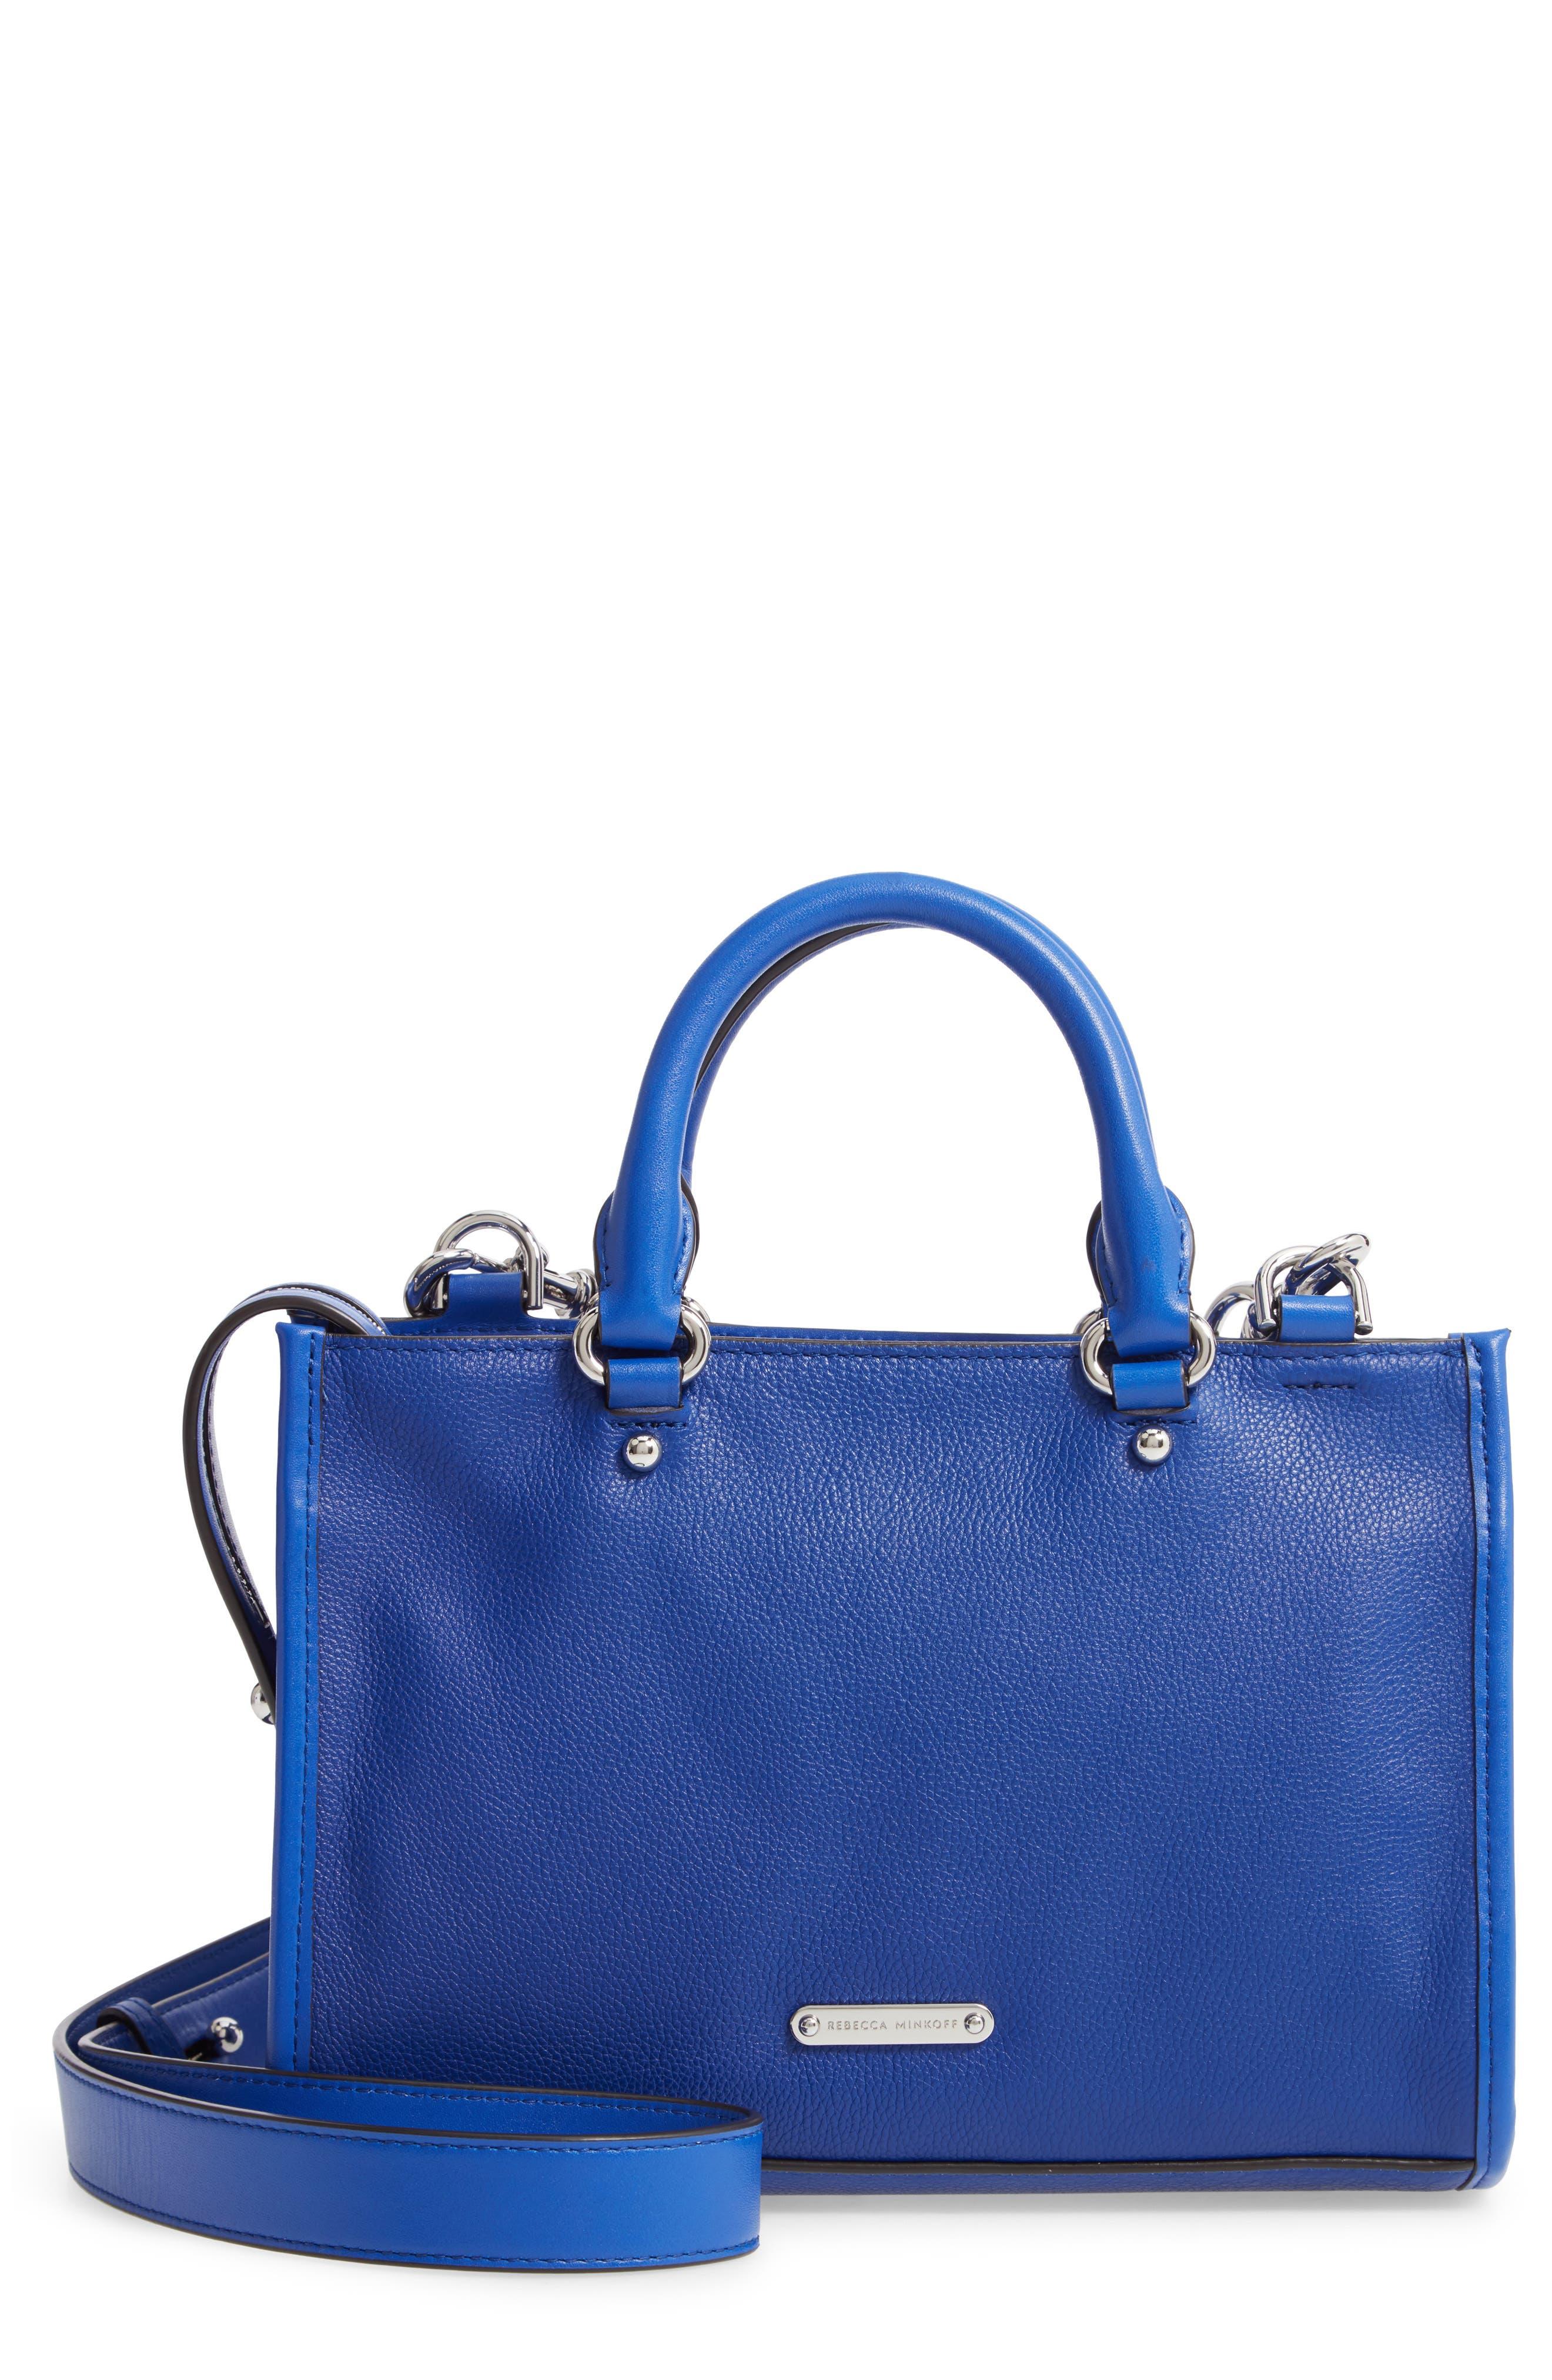 REBECCA MINKOFF Micro Bedford Leather Satchel, Main, color, BRIGHT BLUE